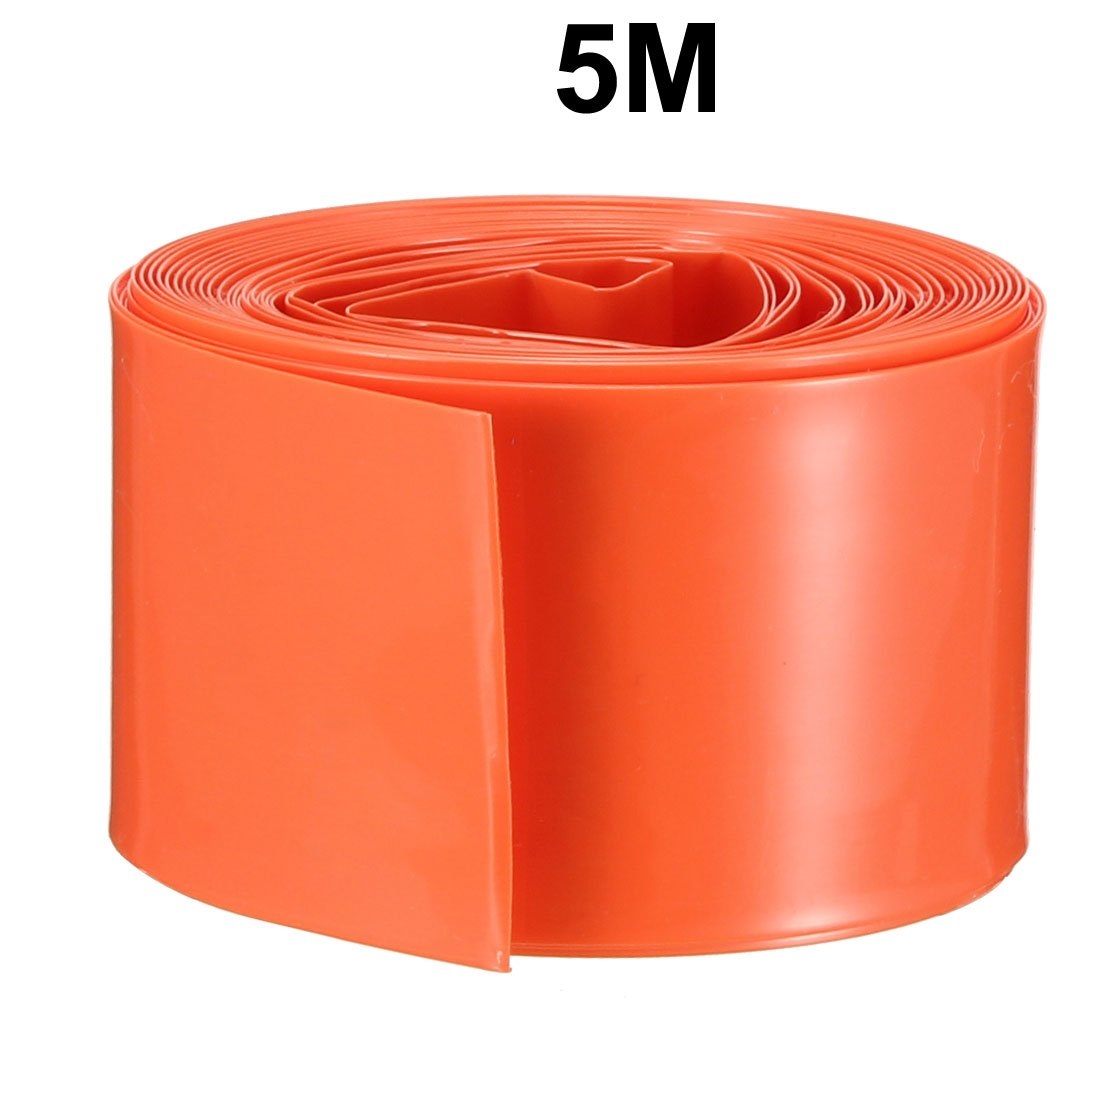 uxcell 5M 29.5mm Width PVC Heat Shrink Tubing Orange for 1 x 18650 Battery